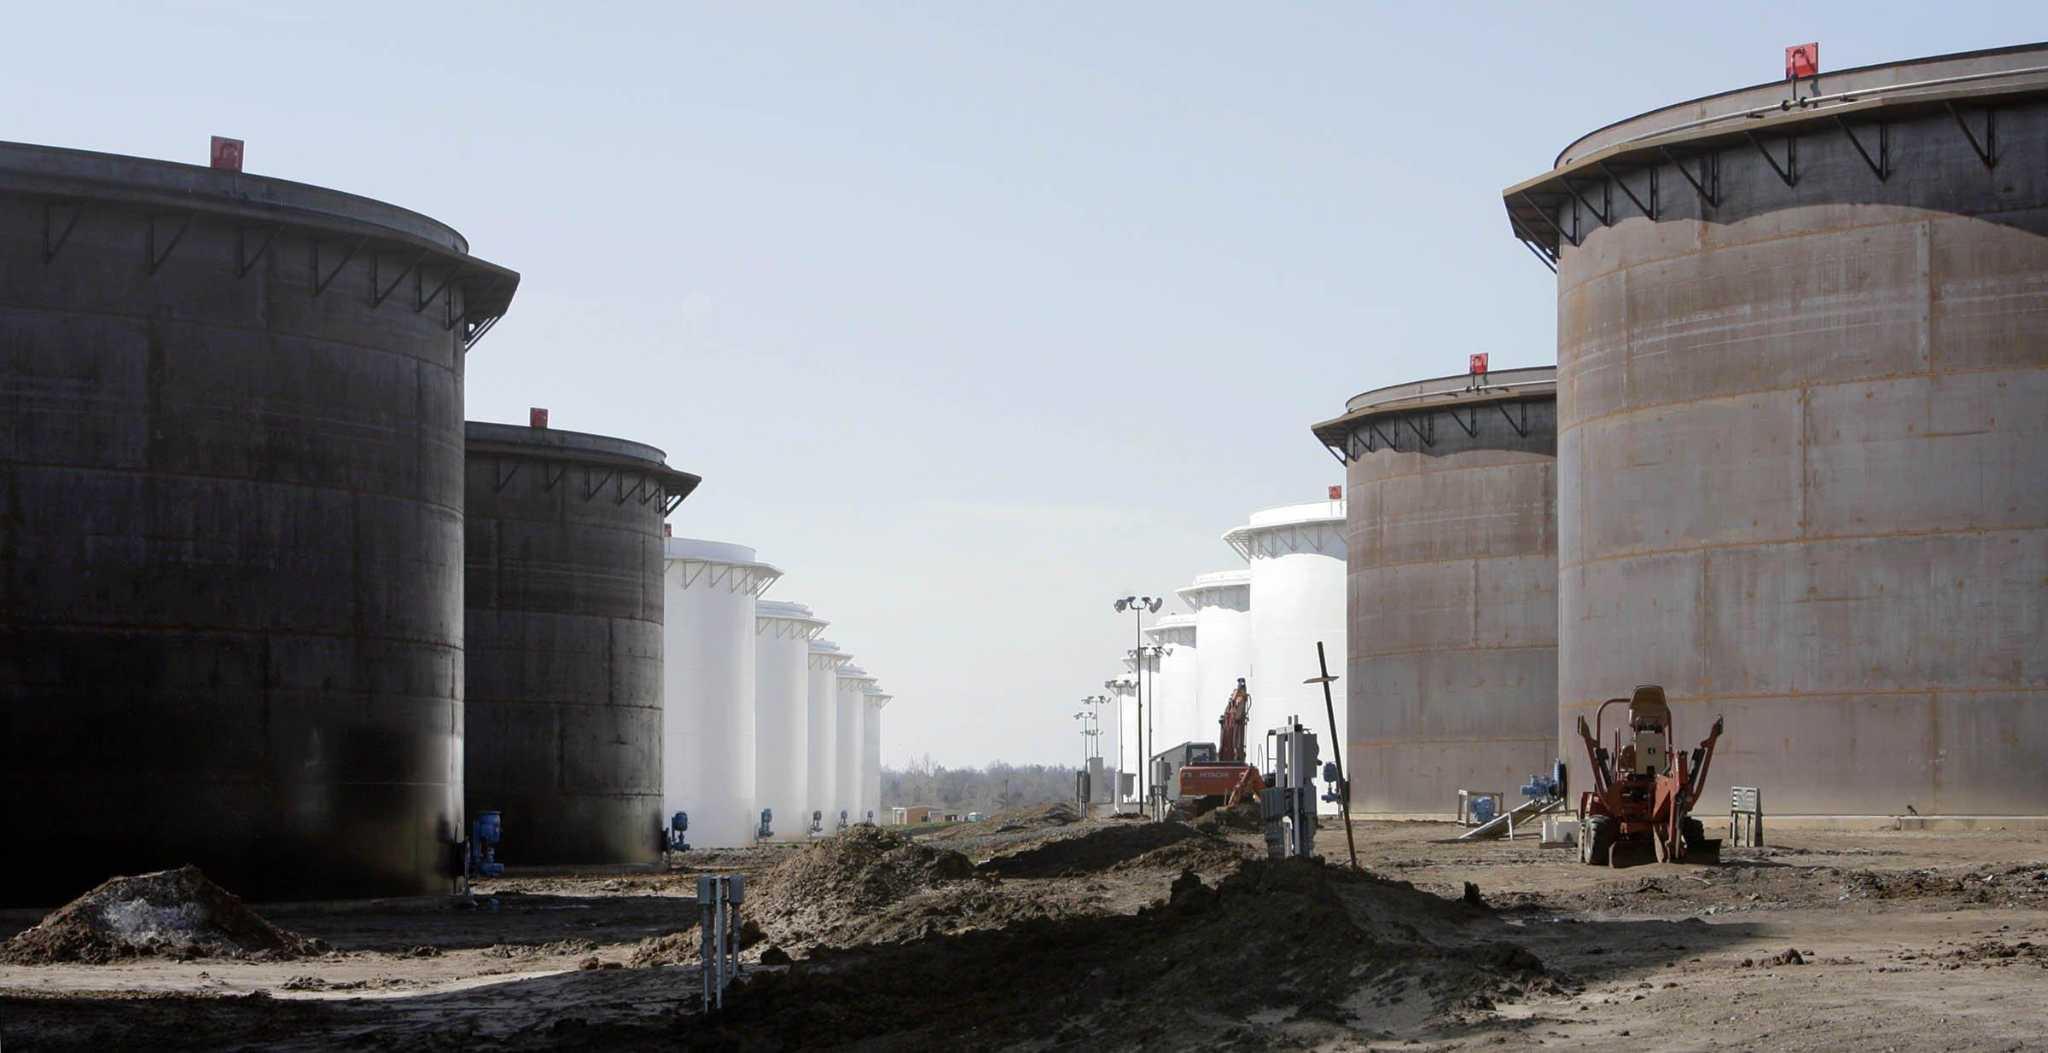 Oil extends winning streak on Saudi supply cuts, trade optimism